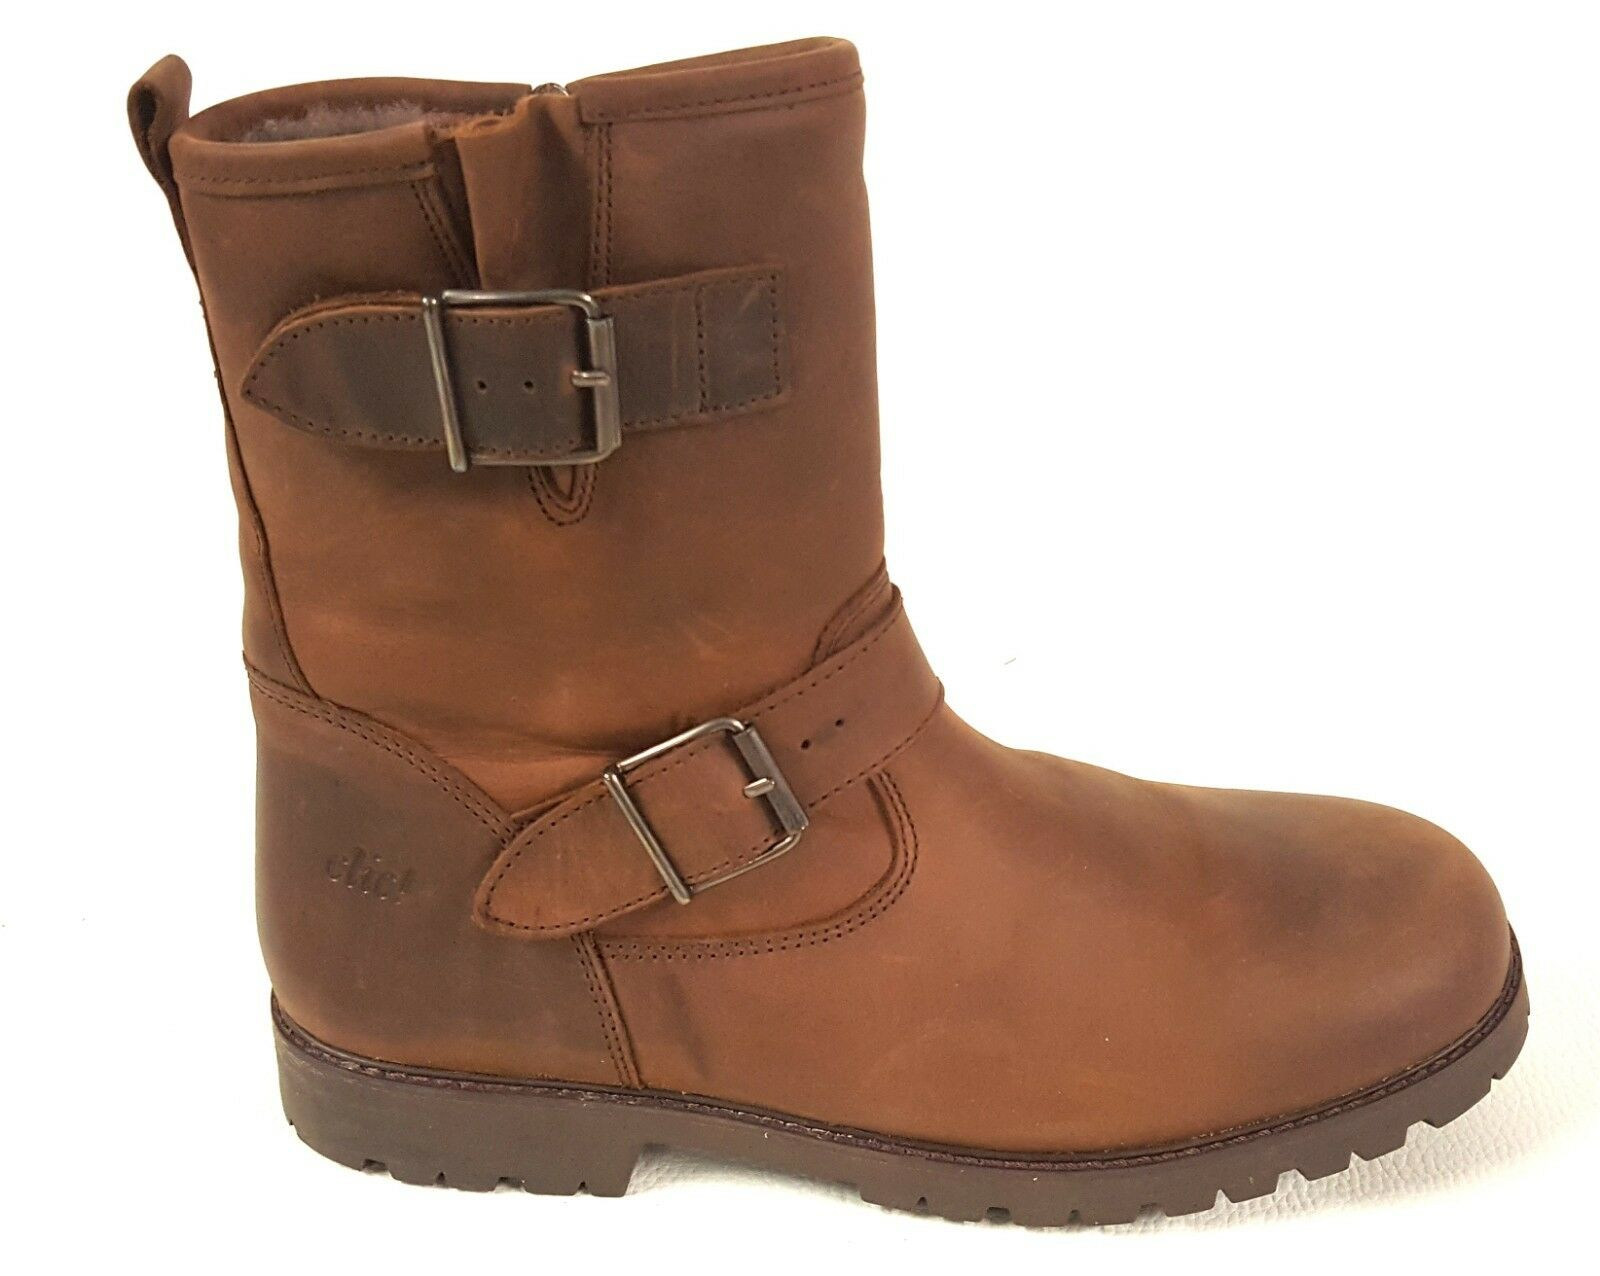 BERA! Bottes Motard Motard Motard Bottes Femmes Boots Cuir Doublure chaude   40   Belle Et Charmante  ae3669